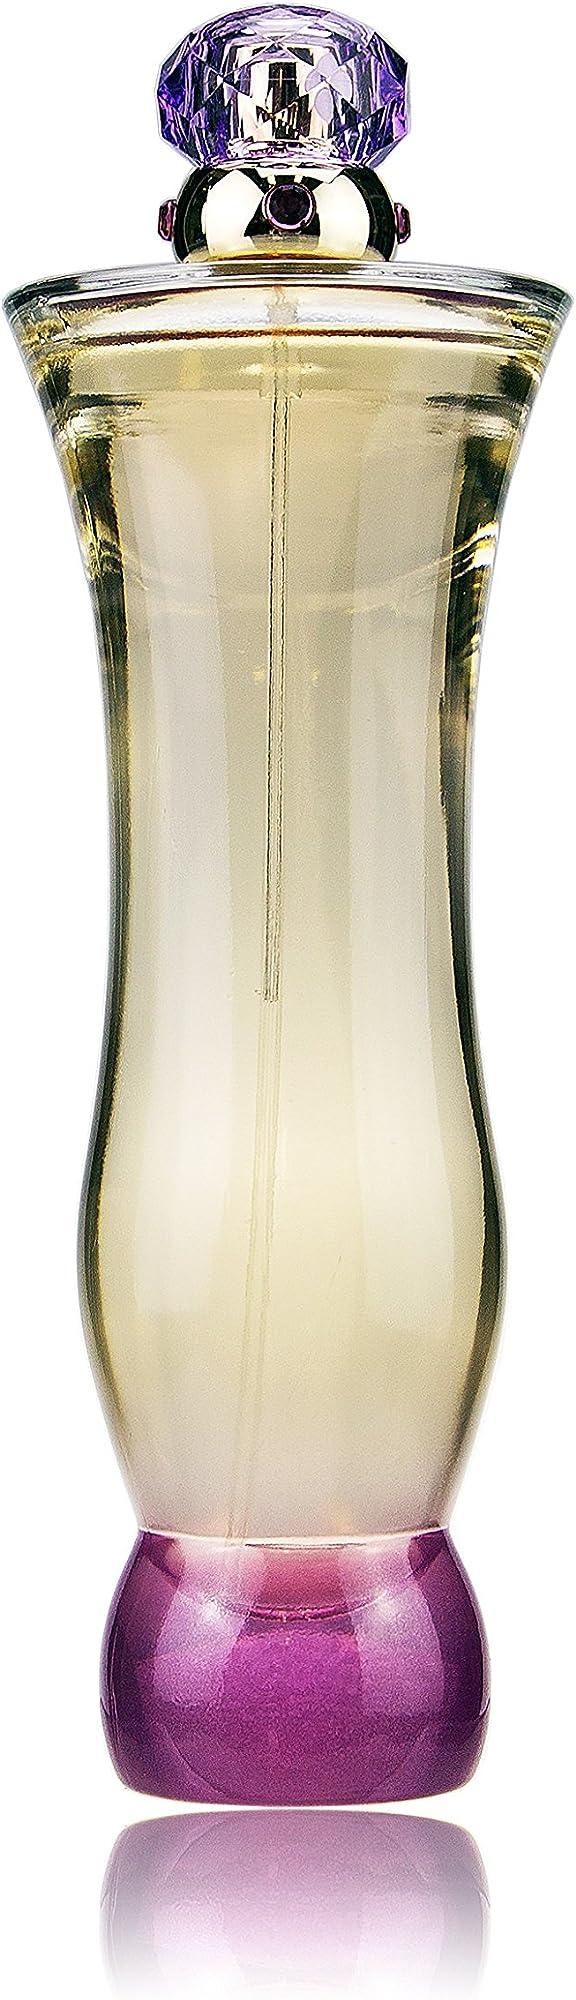 Versace woman eau de perfume per donna spray 100ml 14491l